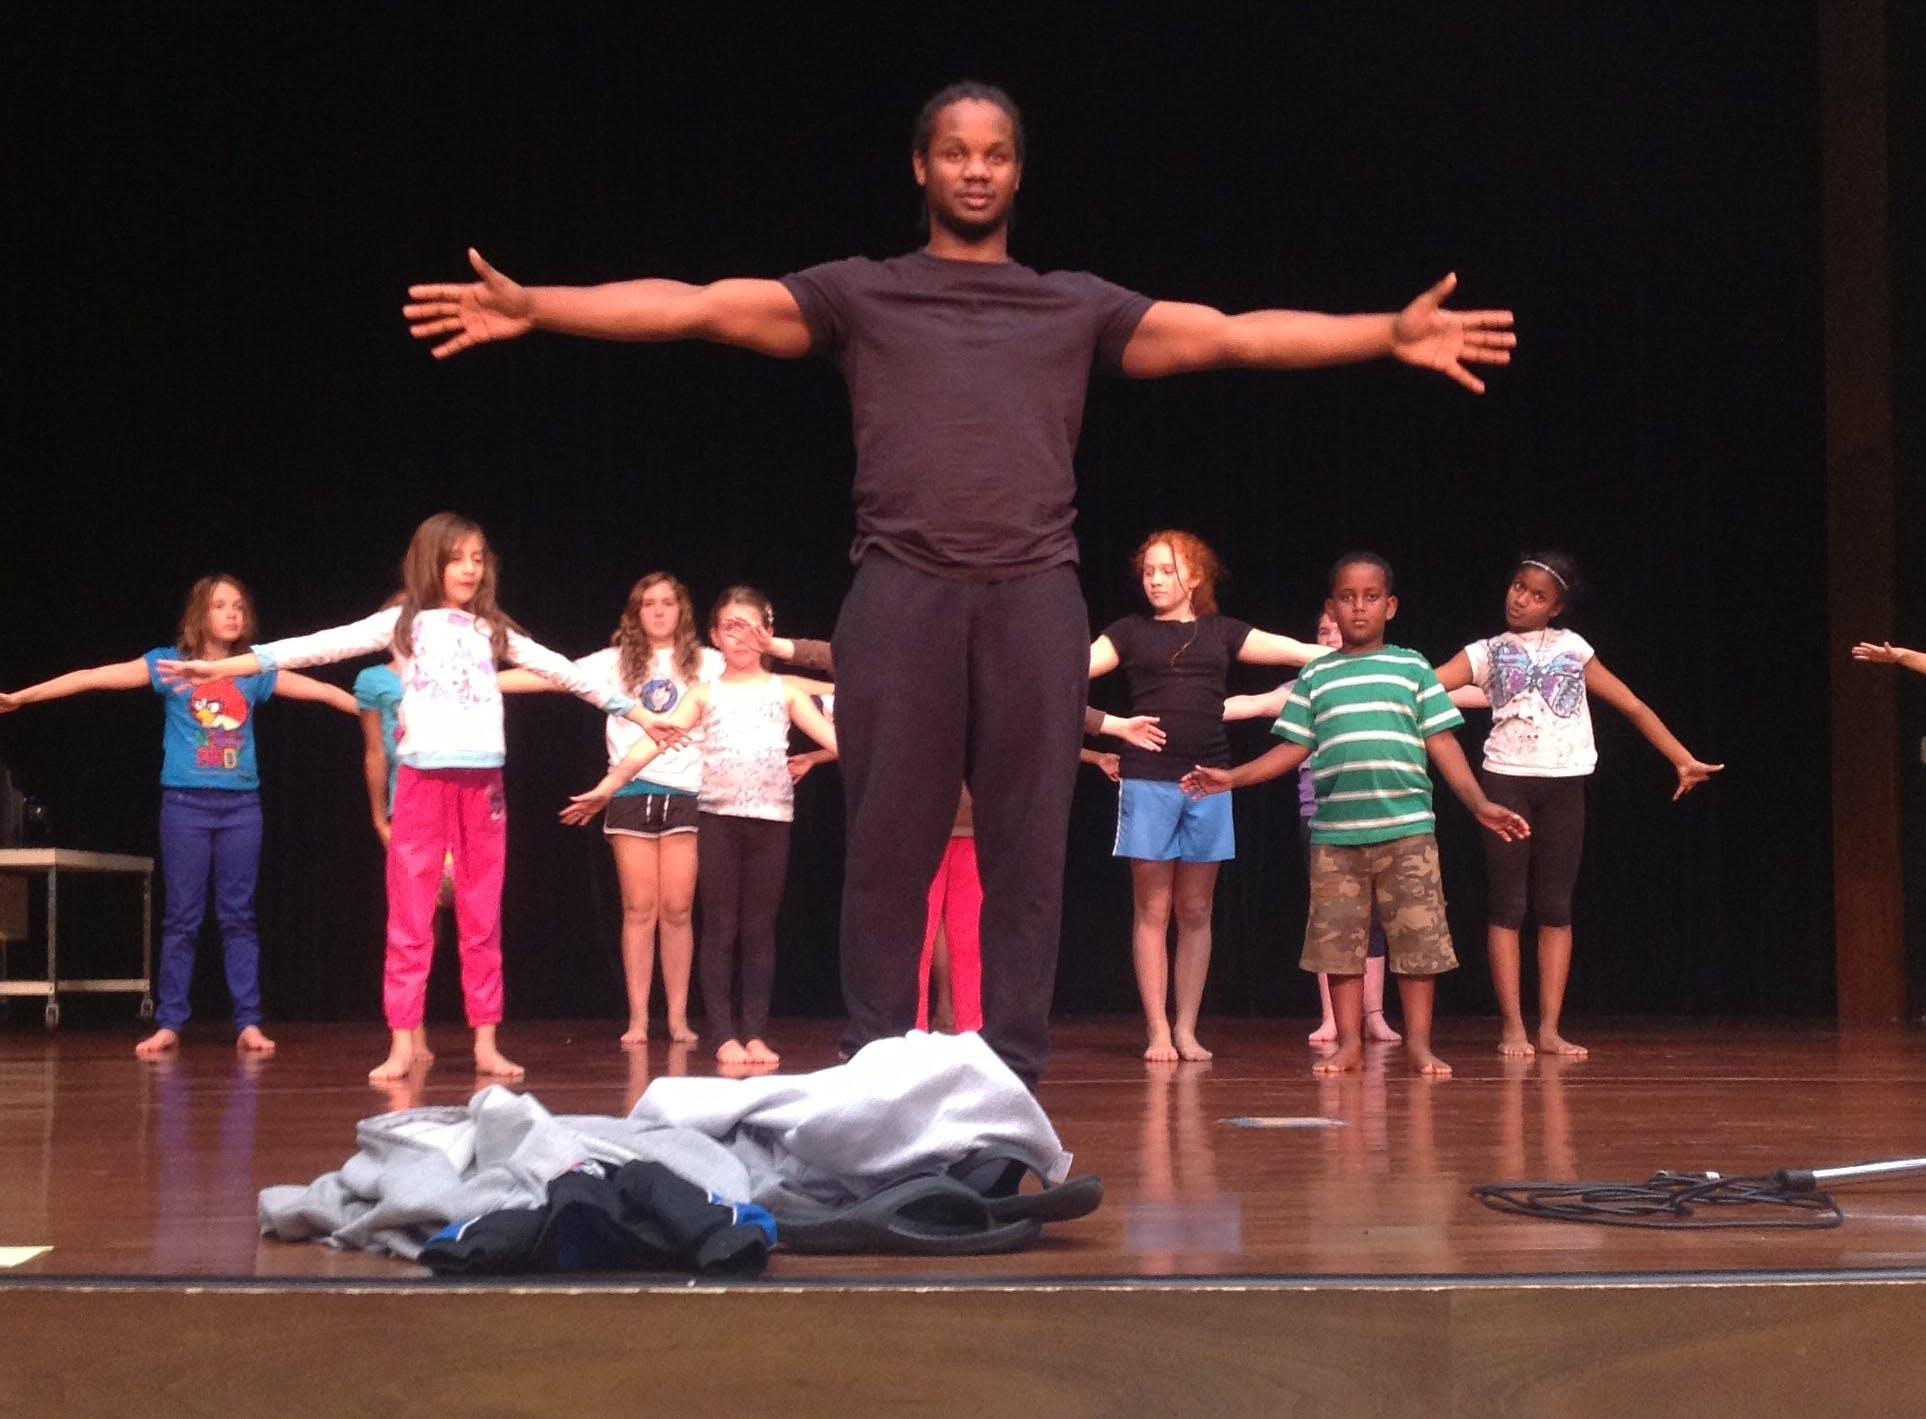 <p><em><em>Dominic Moore-Dunson teaching at Ratner School</em>. Photo courtesy of Inlet Dance Theatre.</em></p>